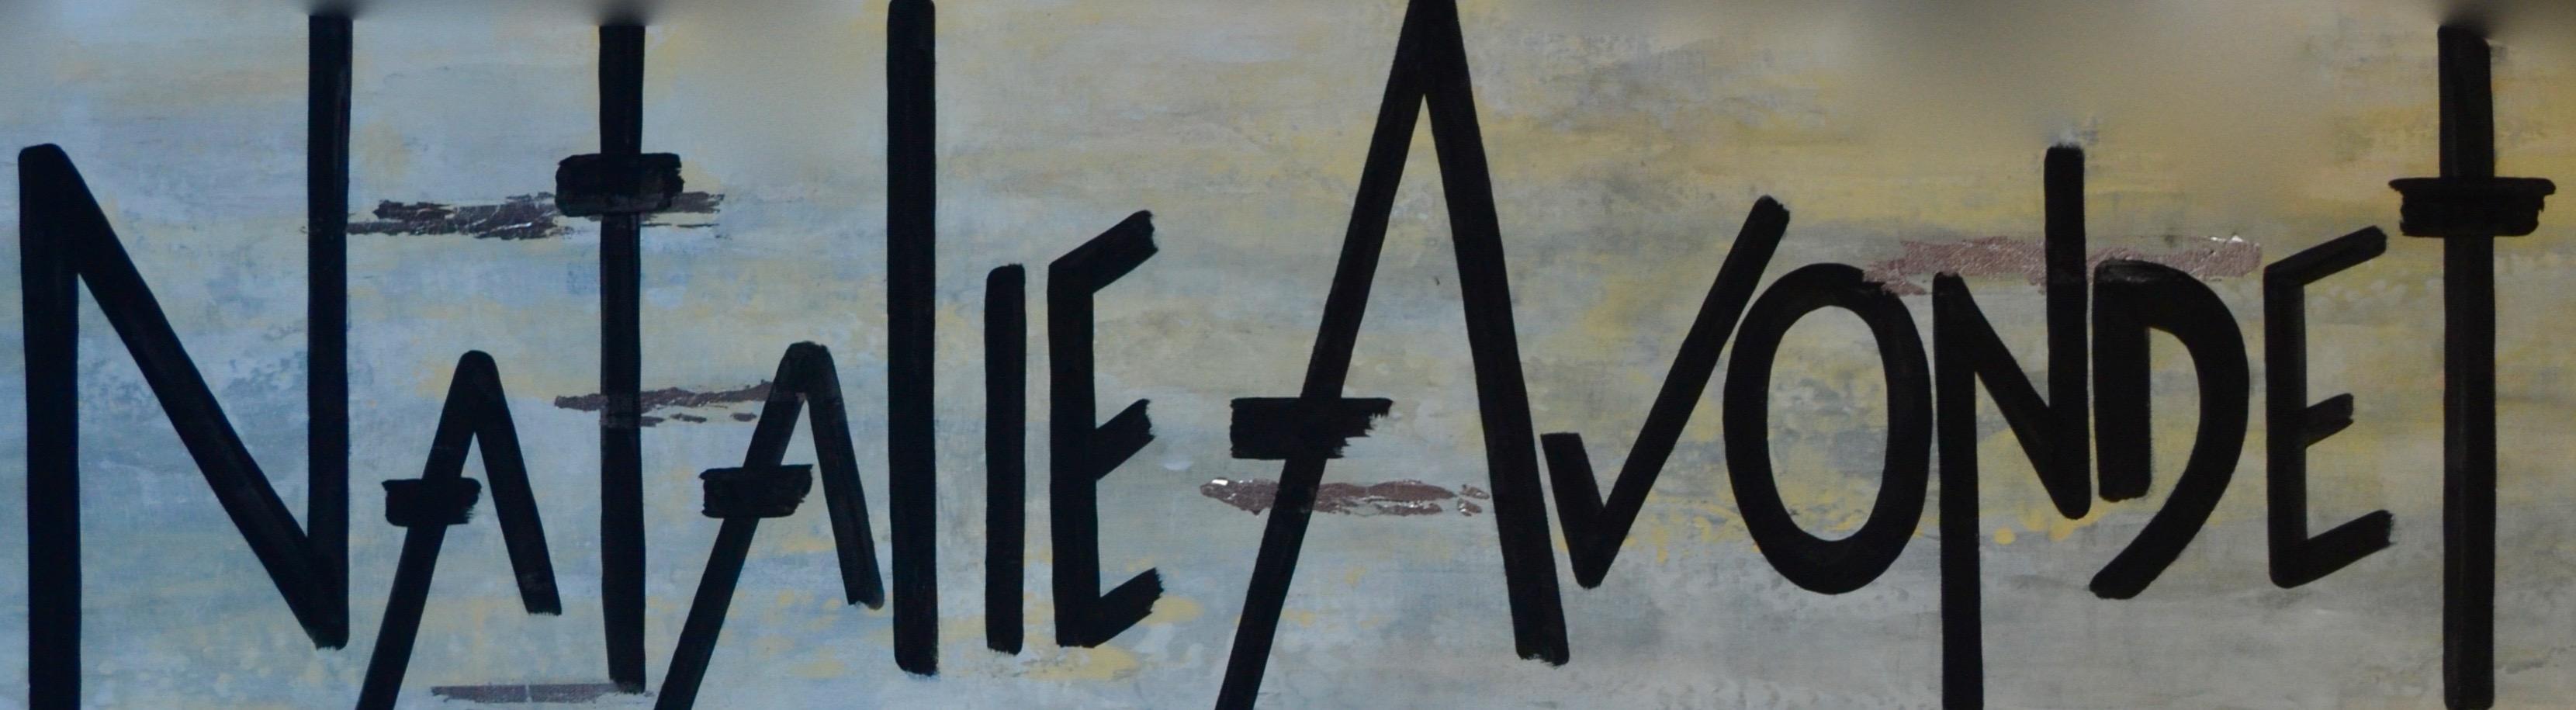 Natalie Avondet's Signature